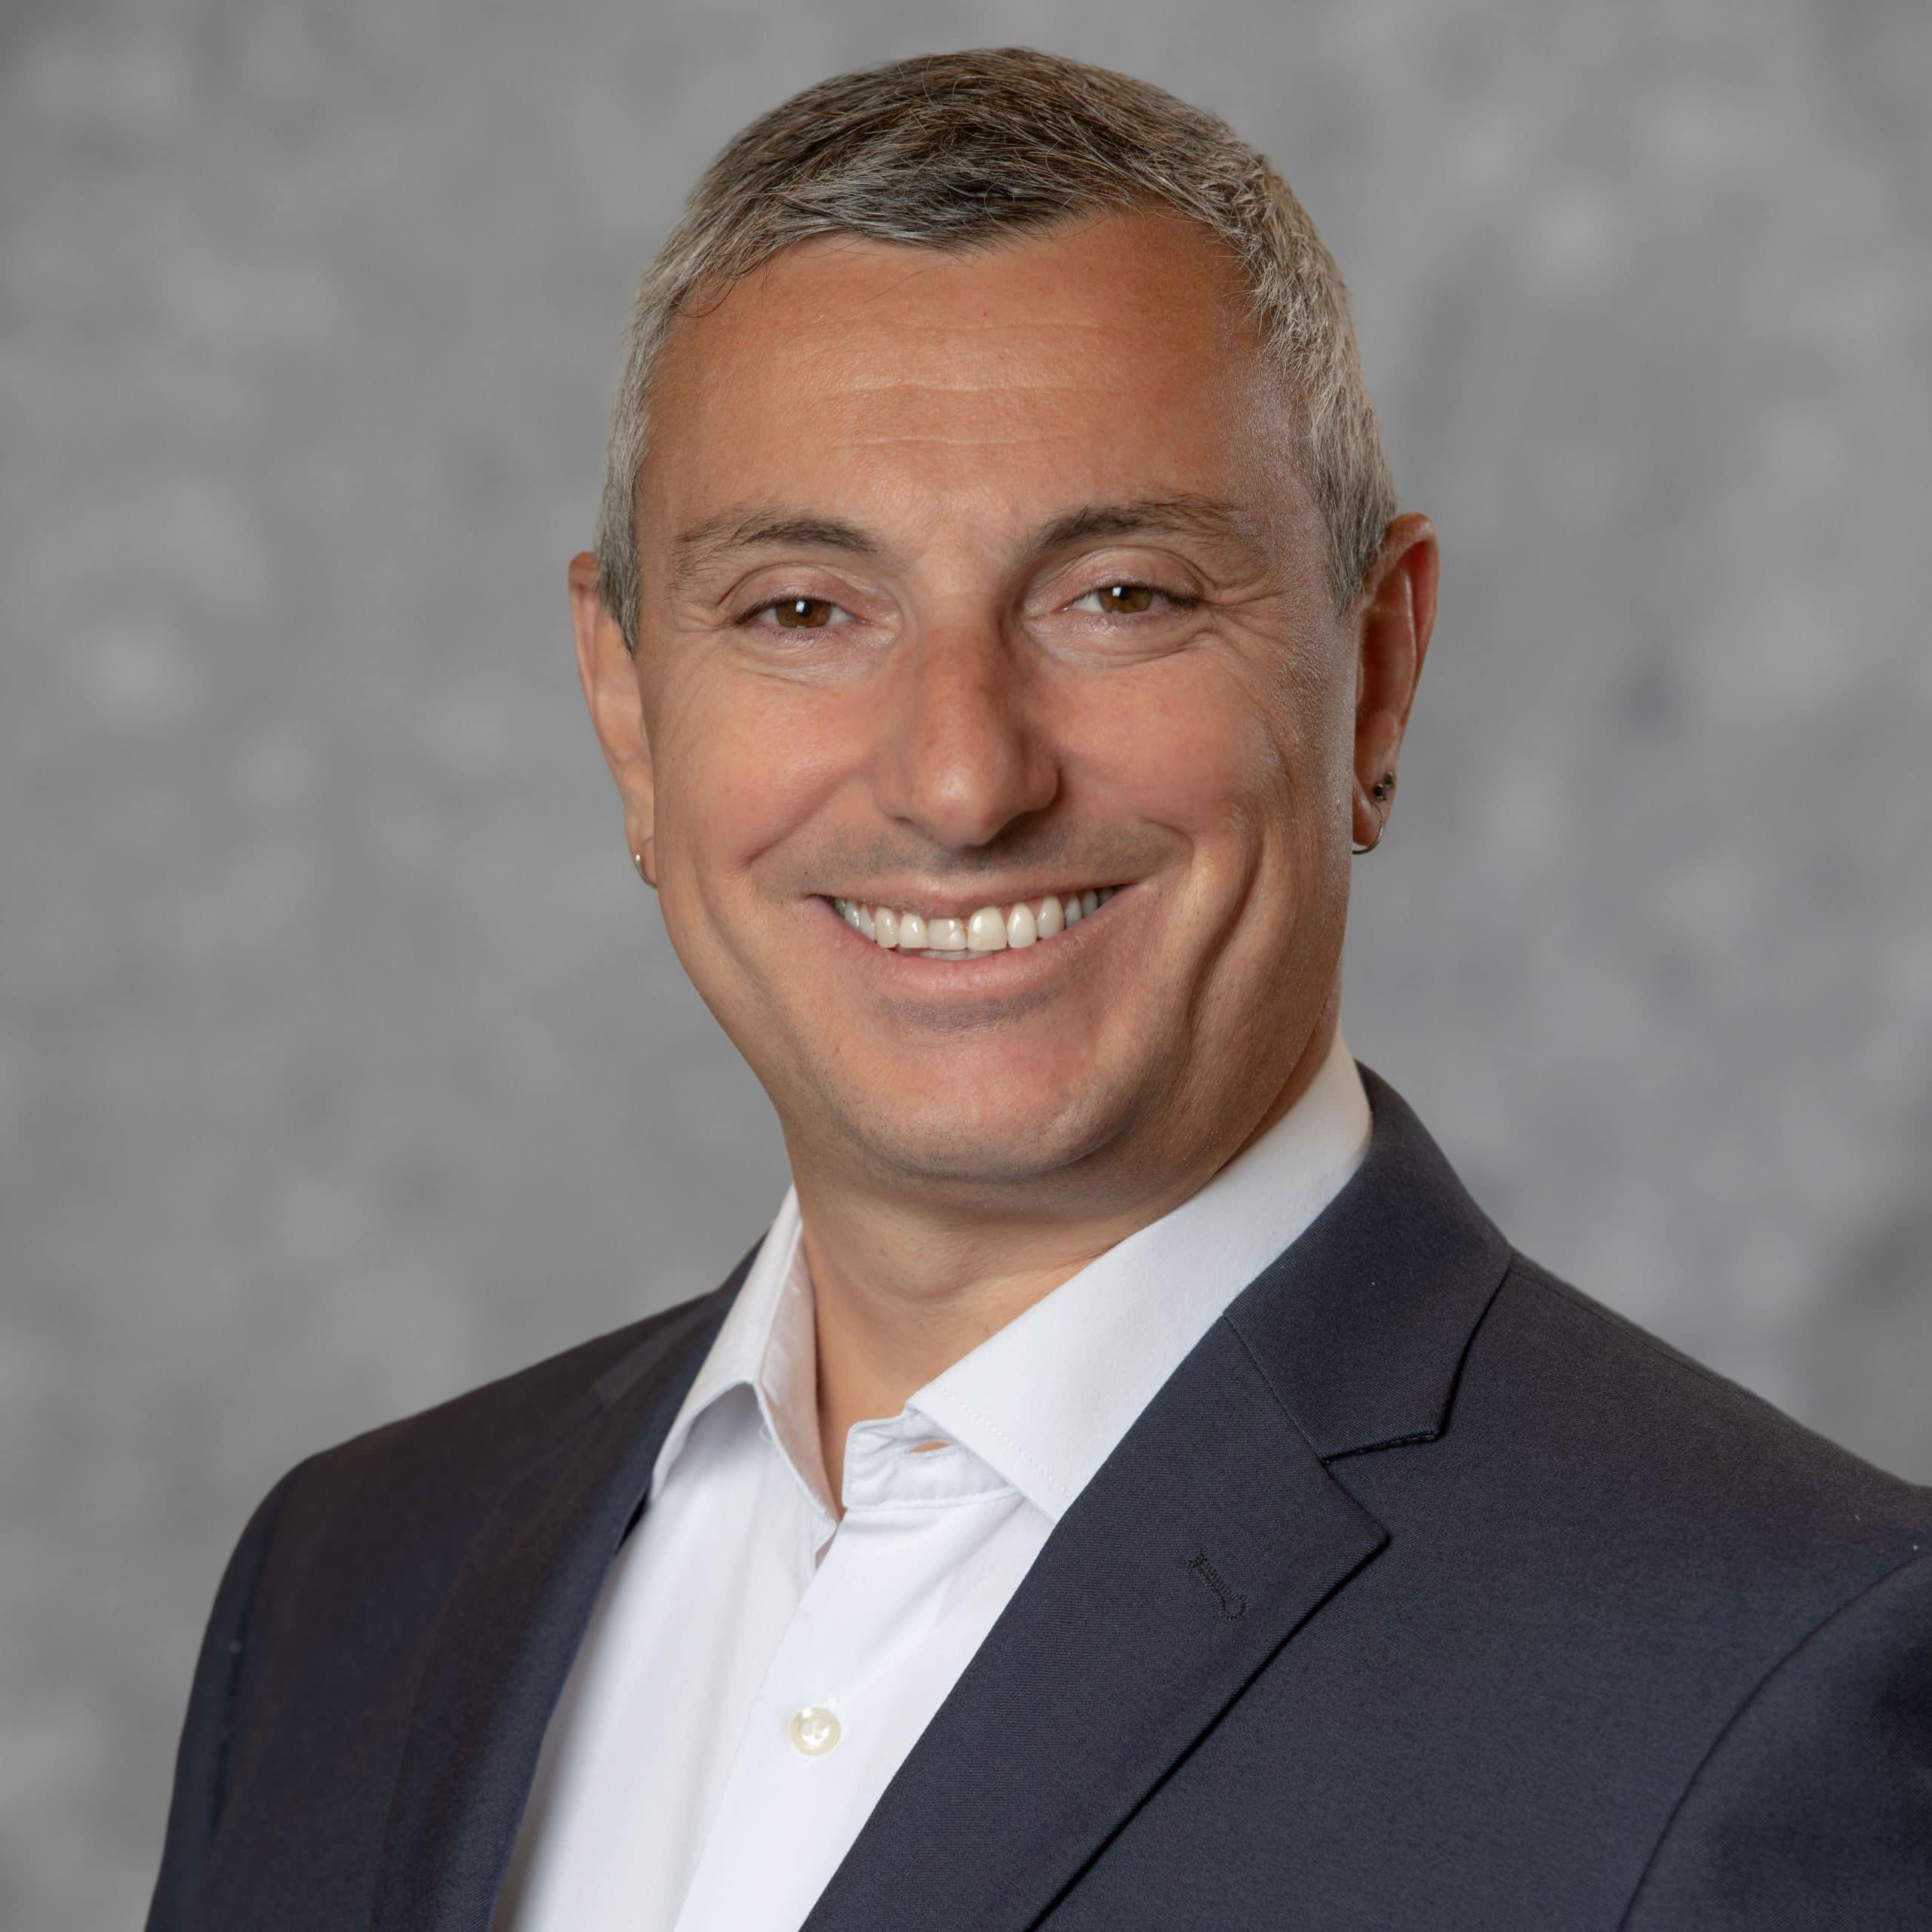 Jean David Benkimoun, CTO and General Manager for EMEA and APAC